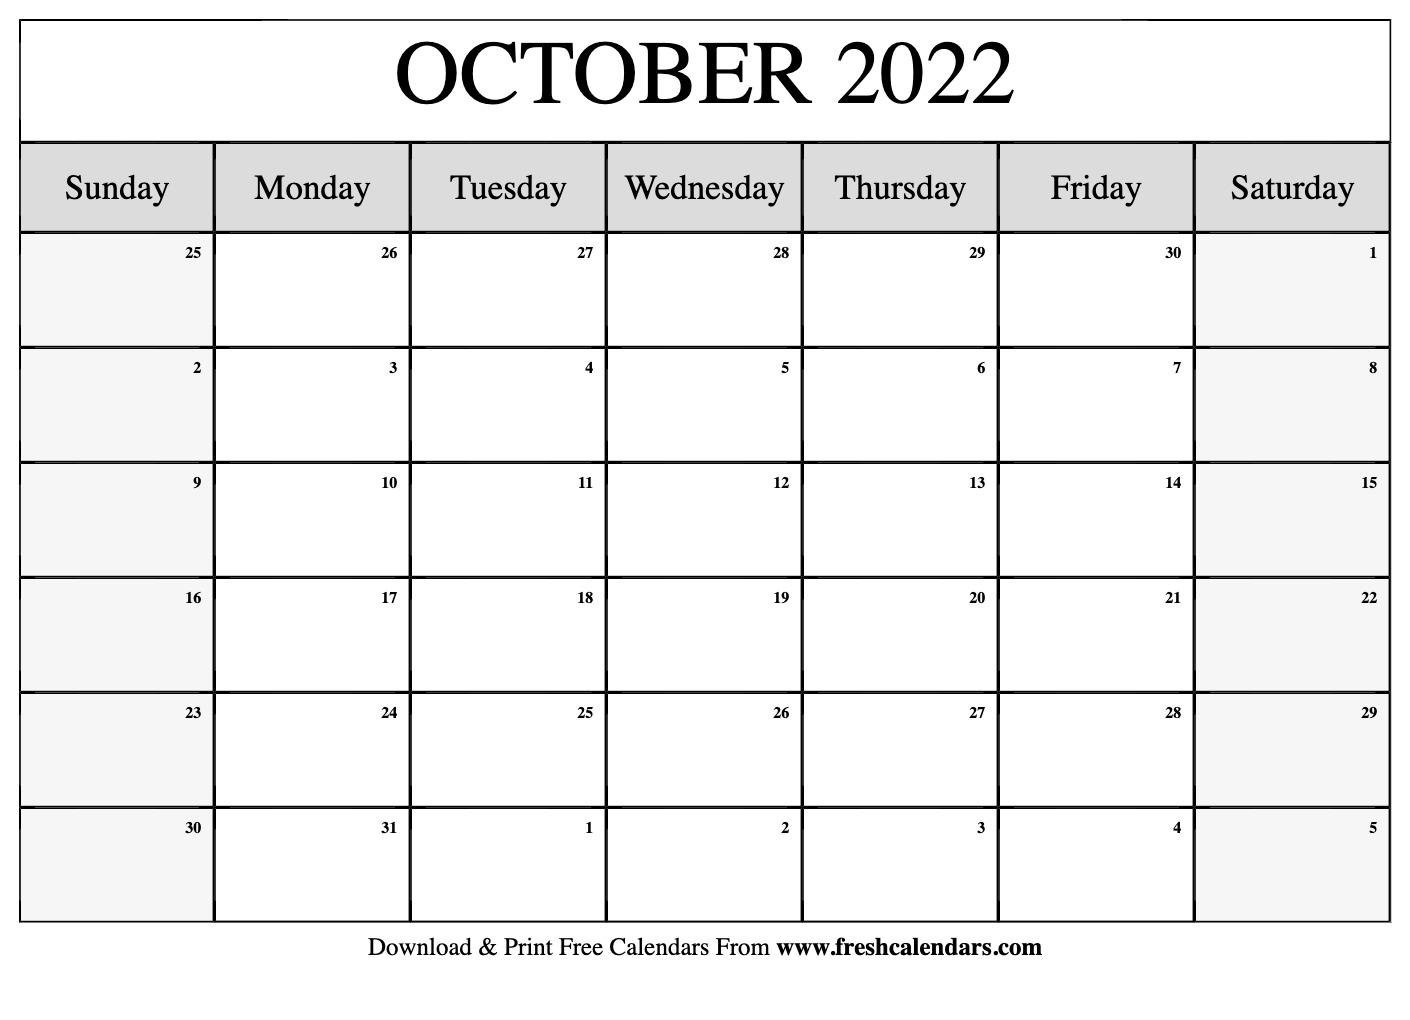 Blank Printable October 2022 Calendars